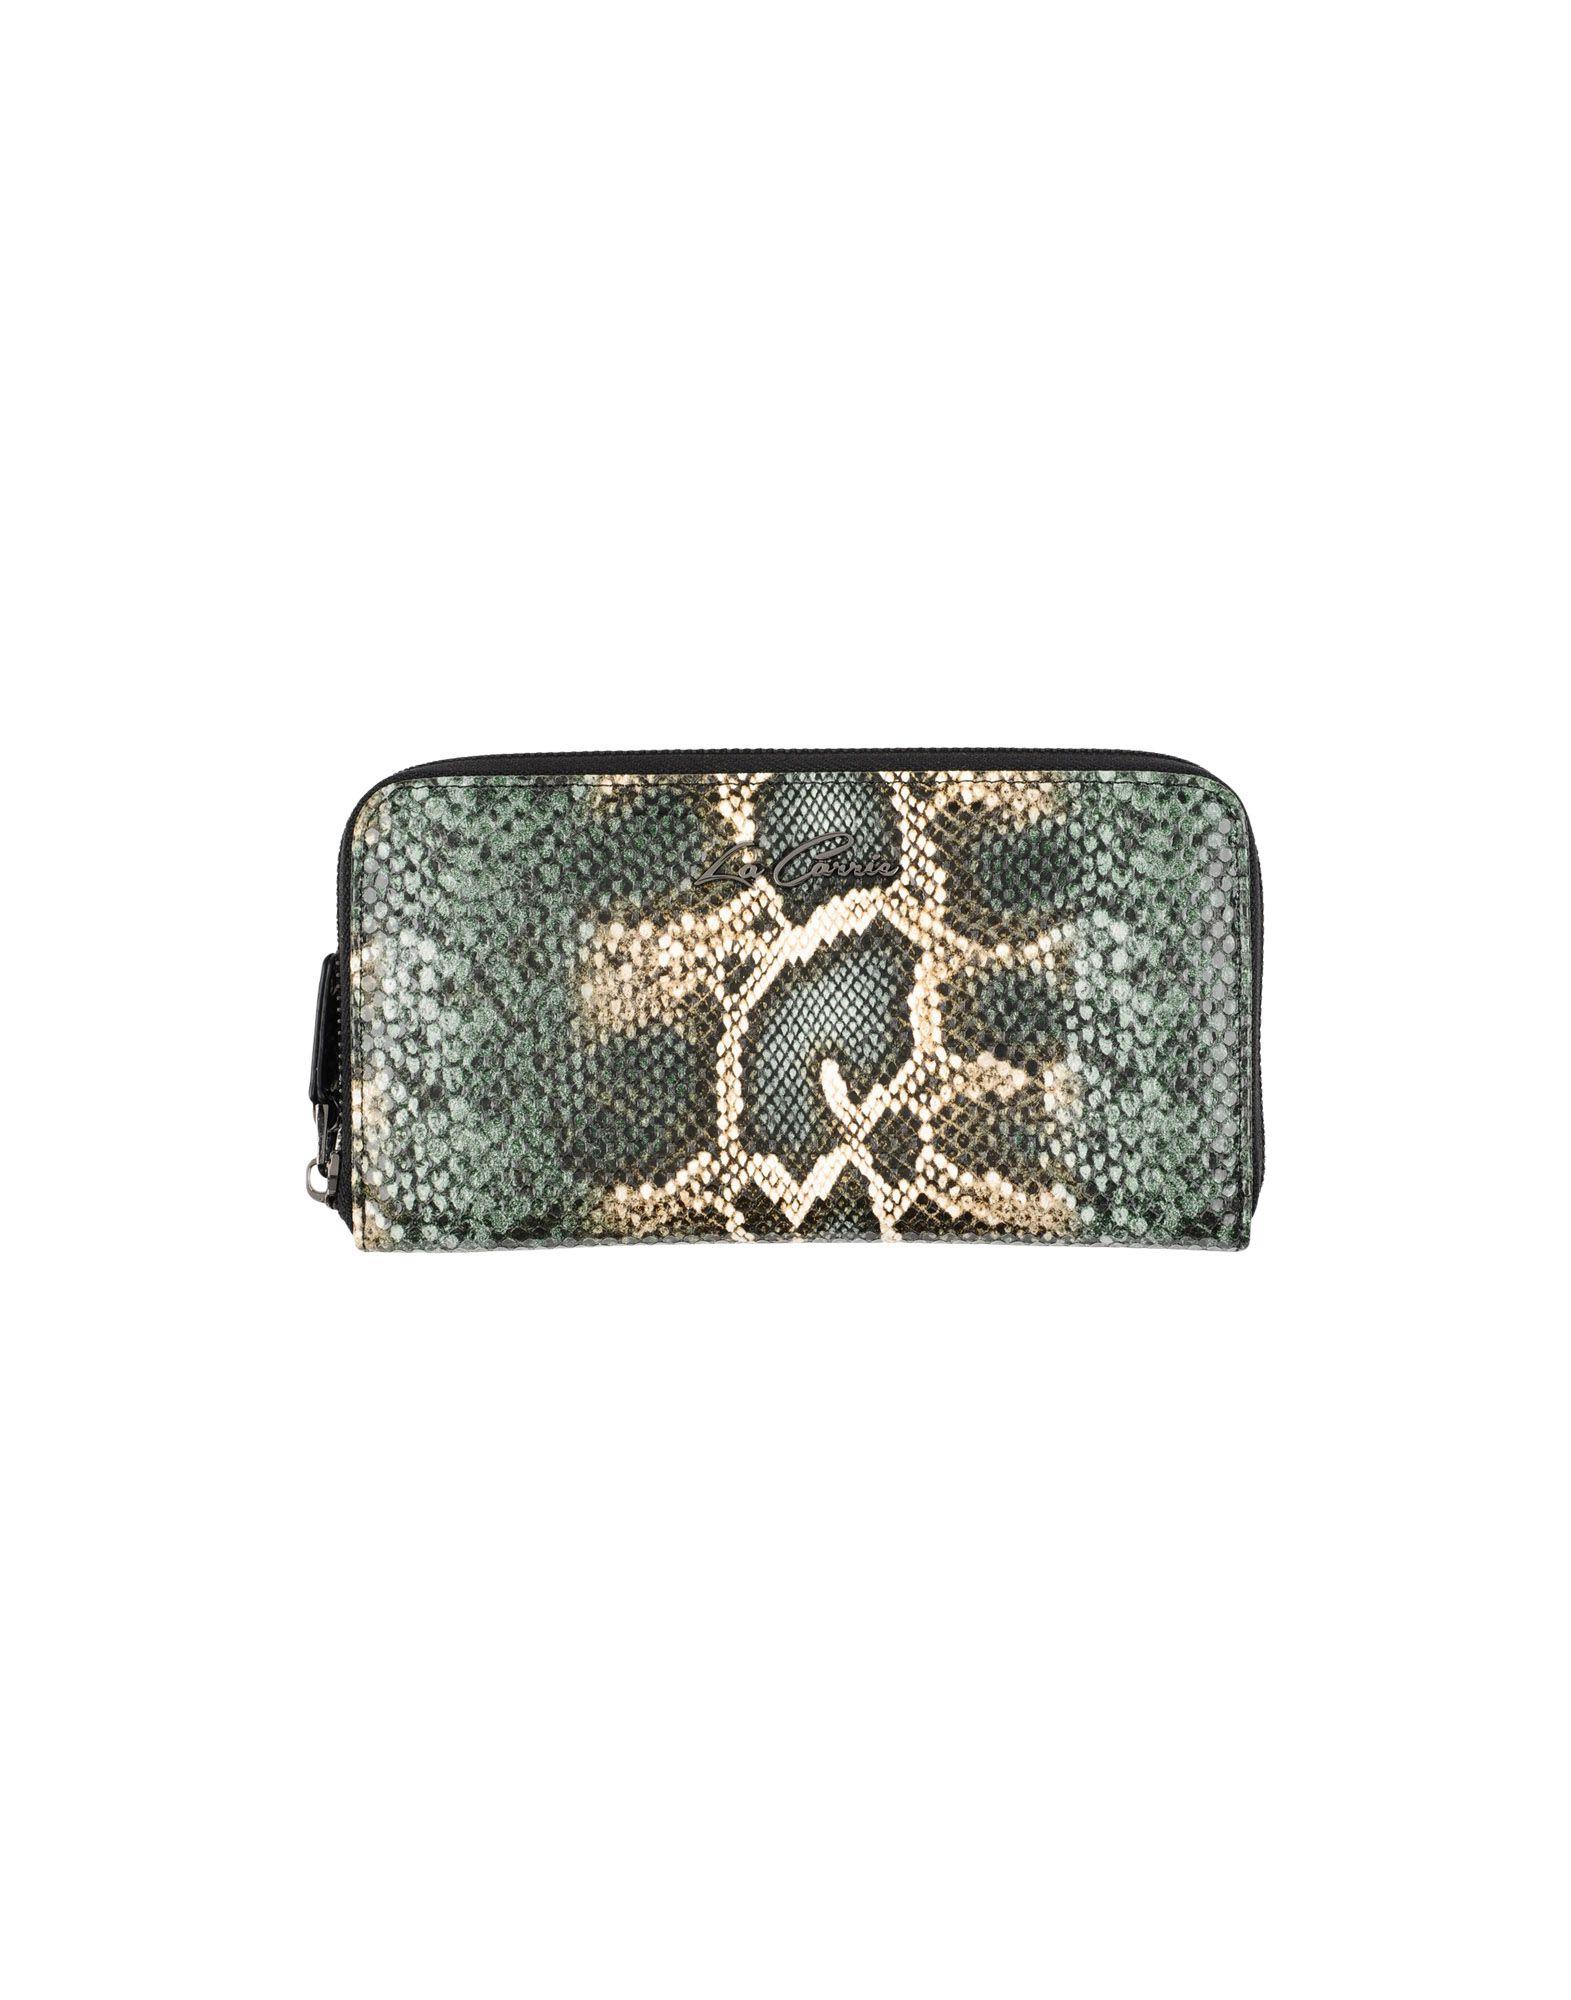 LA CARRIE BAG Damen Brieftasche Farbe Dunkelgrün Größe 1